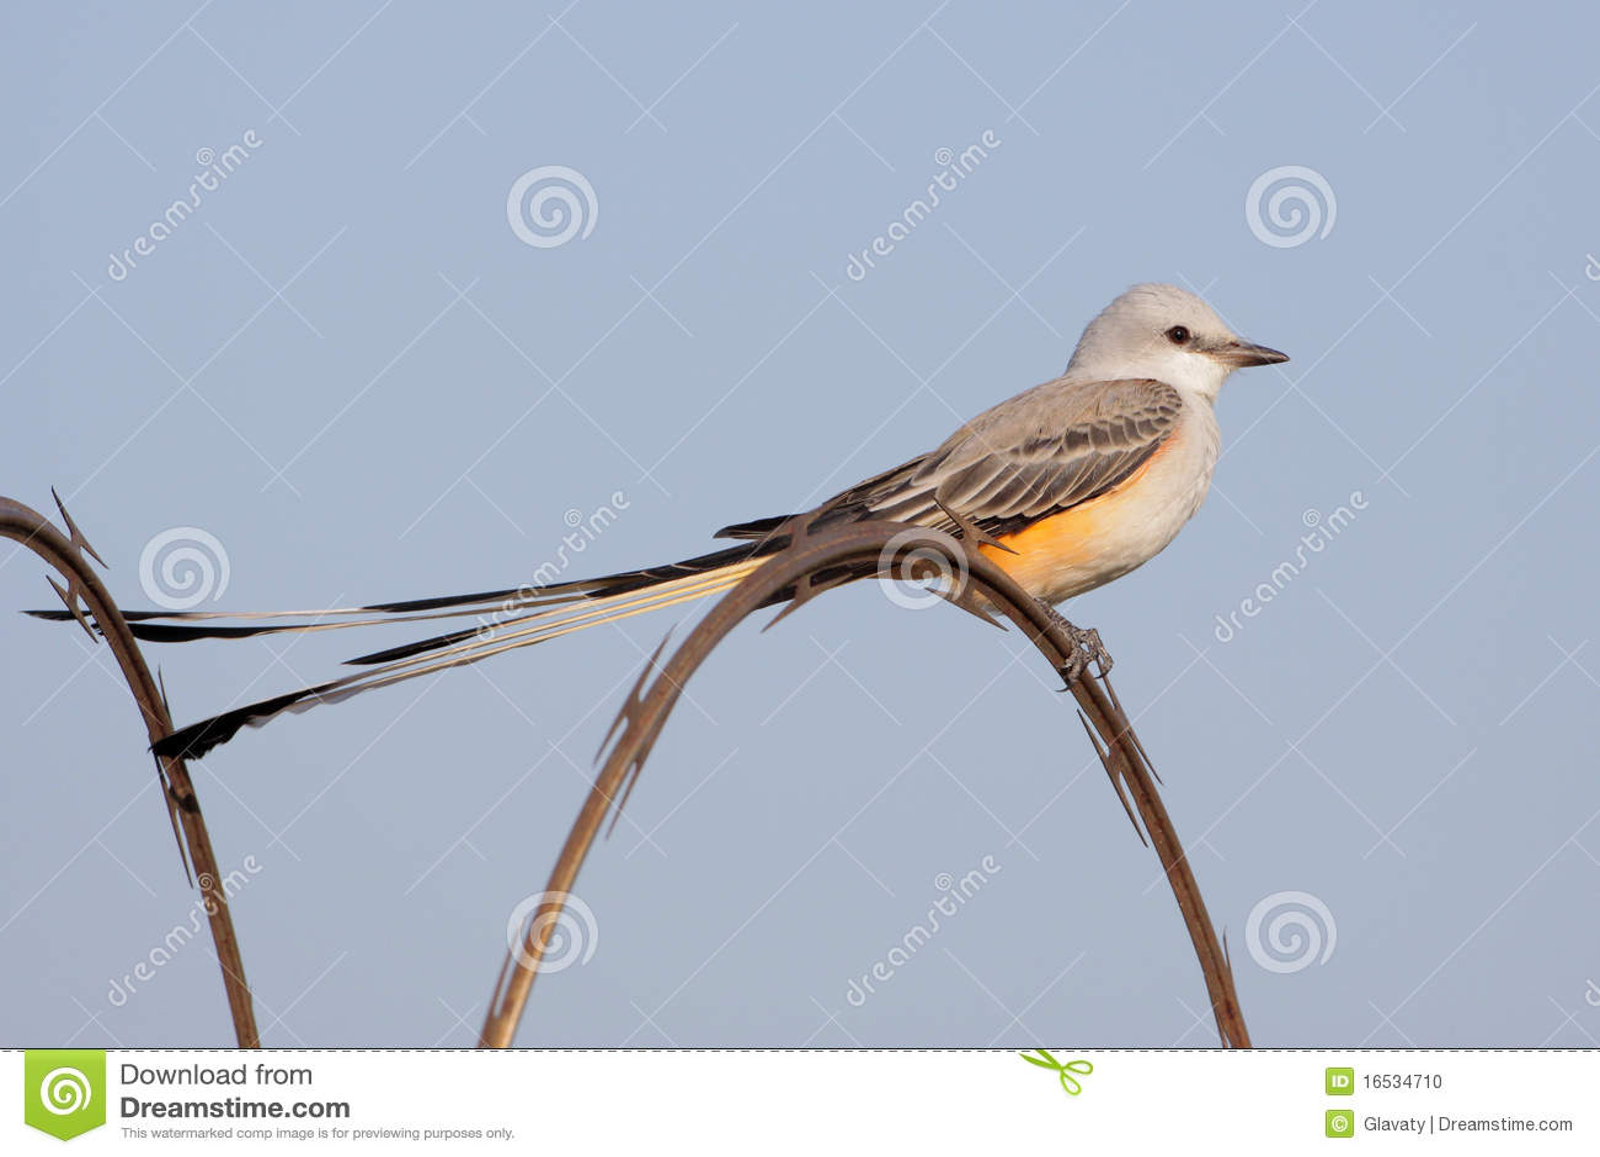 Scissor tailed flycatcher clipart - photo#14